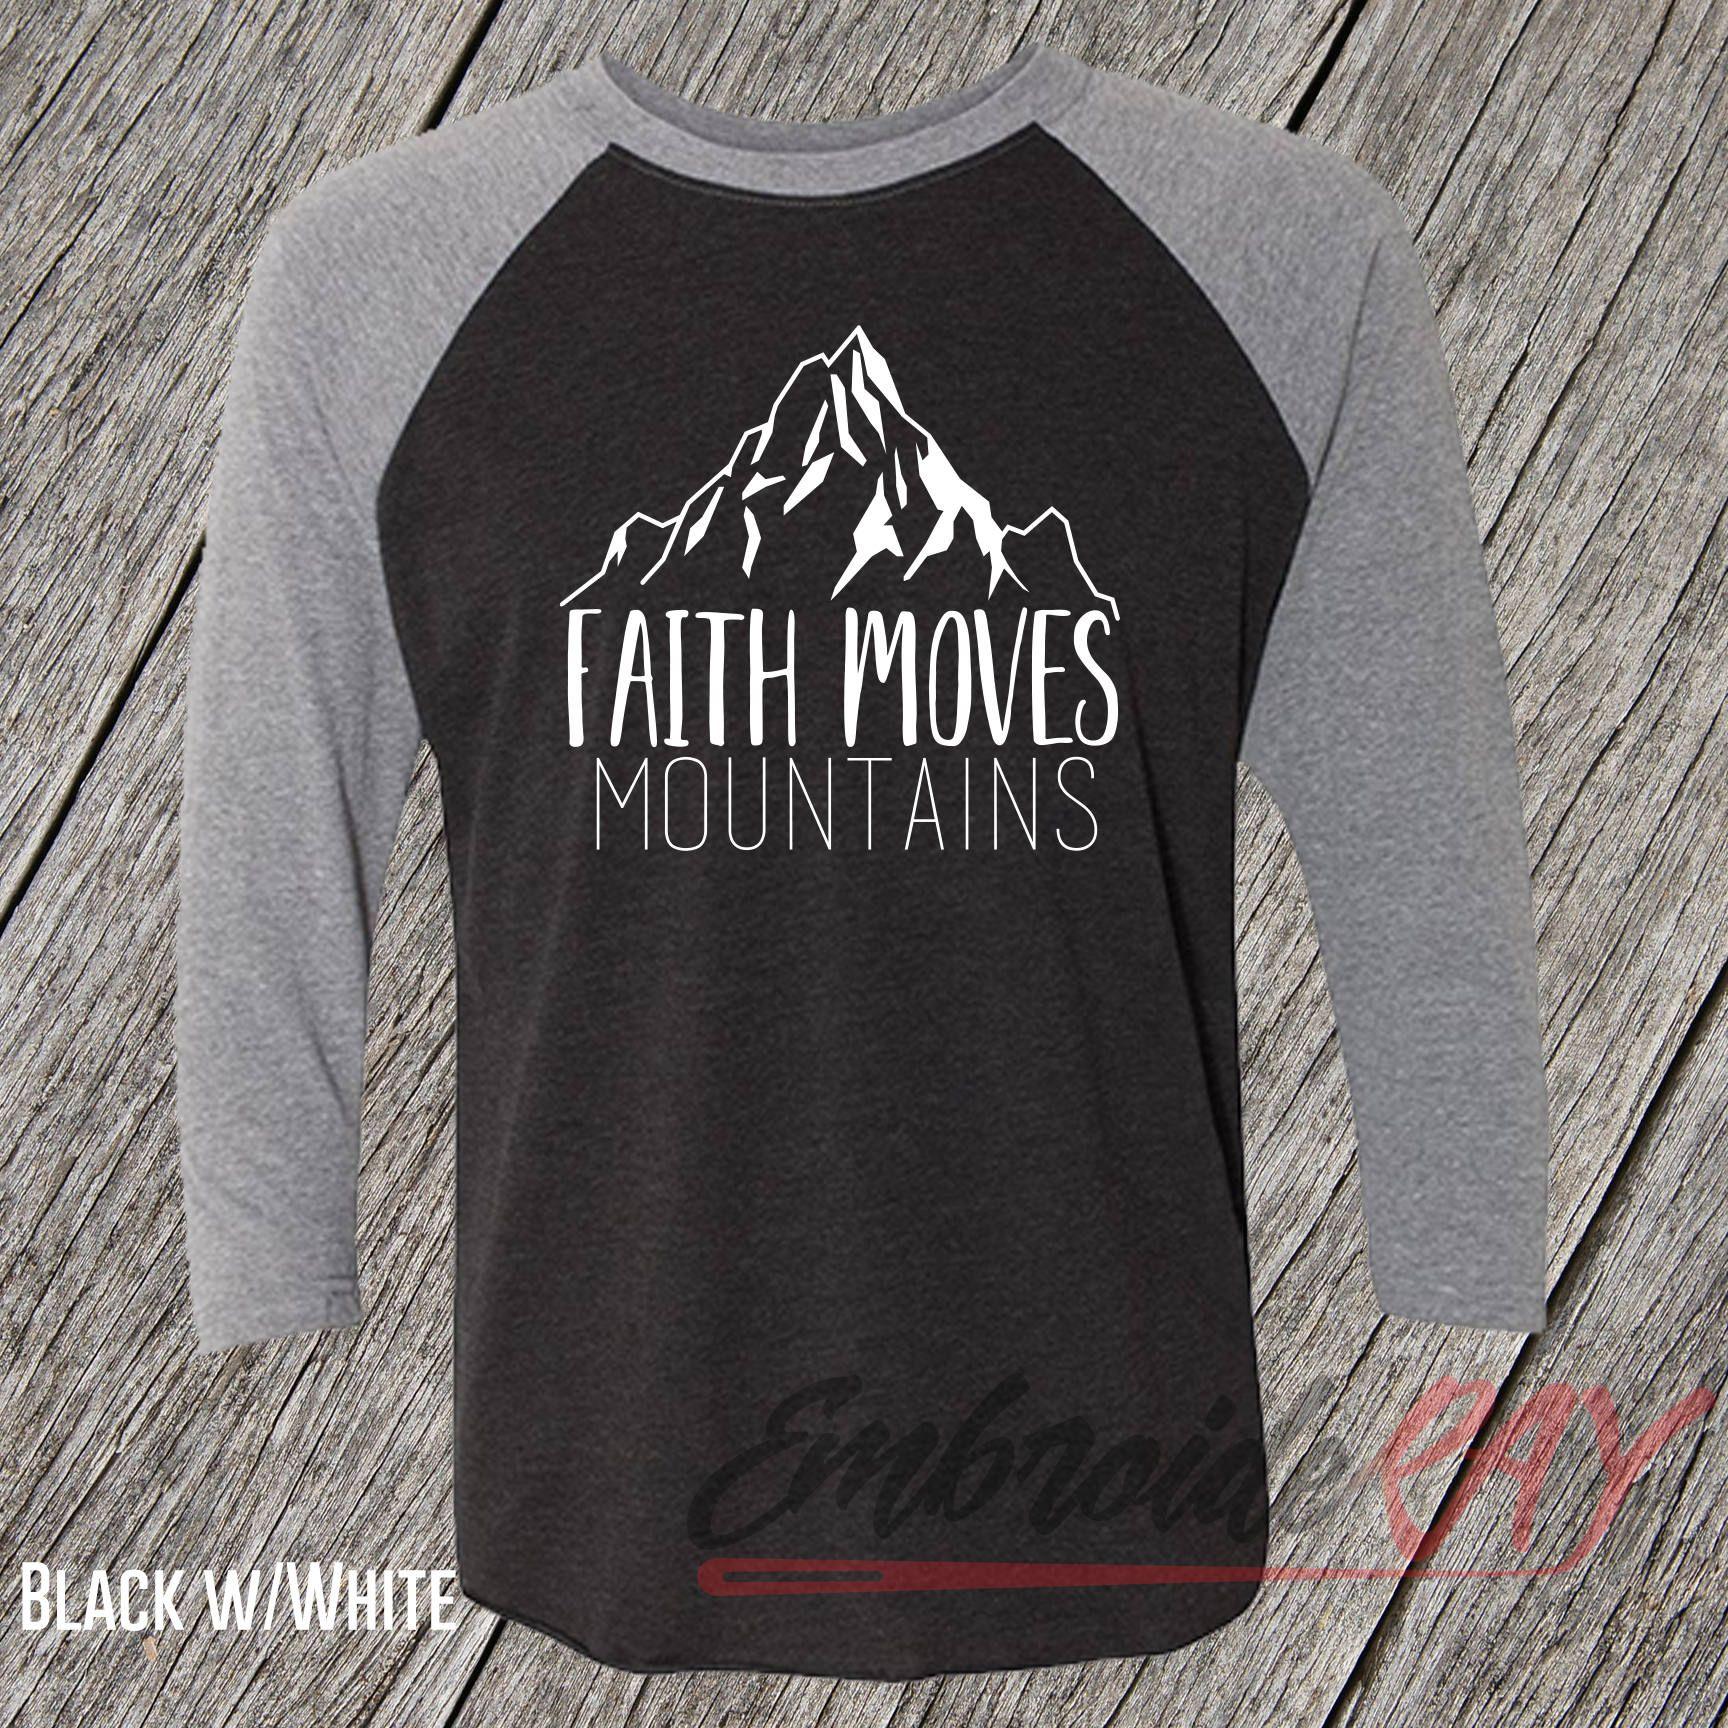 Faith moves mountains christian shirt religion church gift for faith moves mountains christian shirt religion church gift for mom easter shirt negle Images